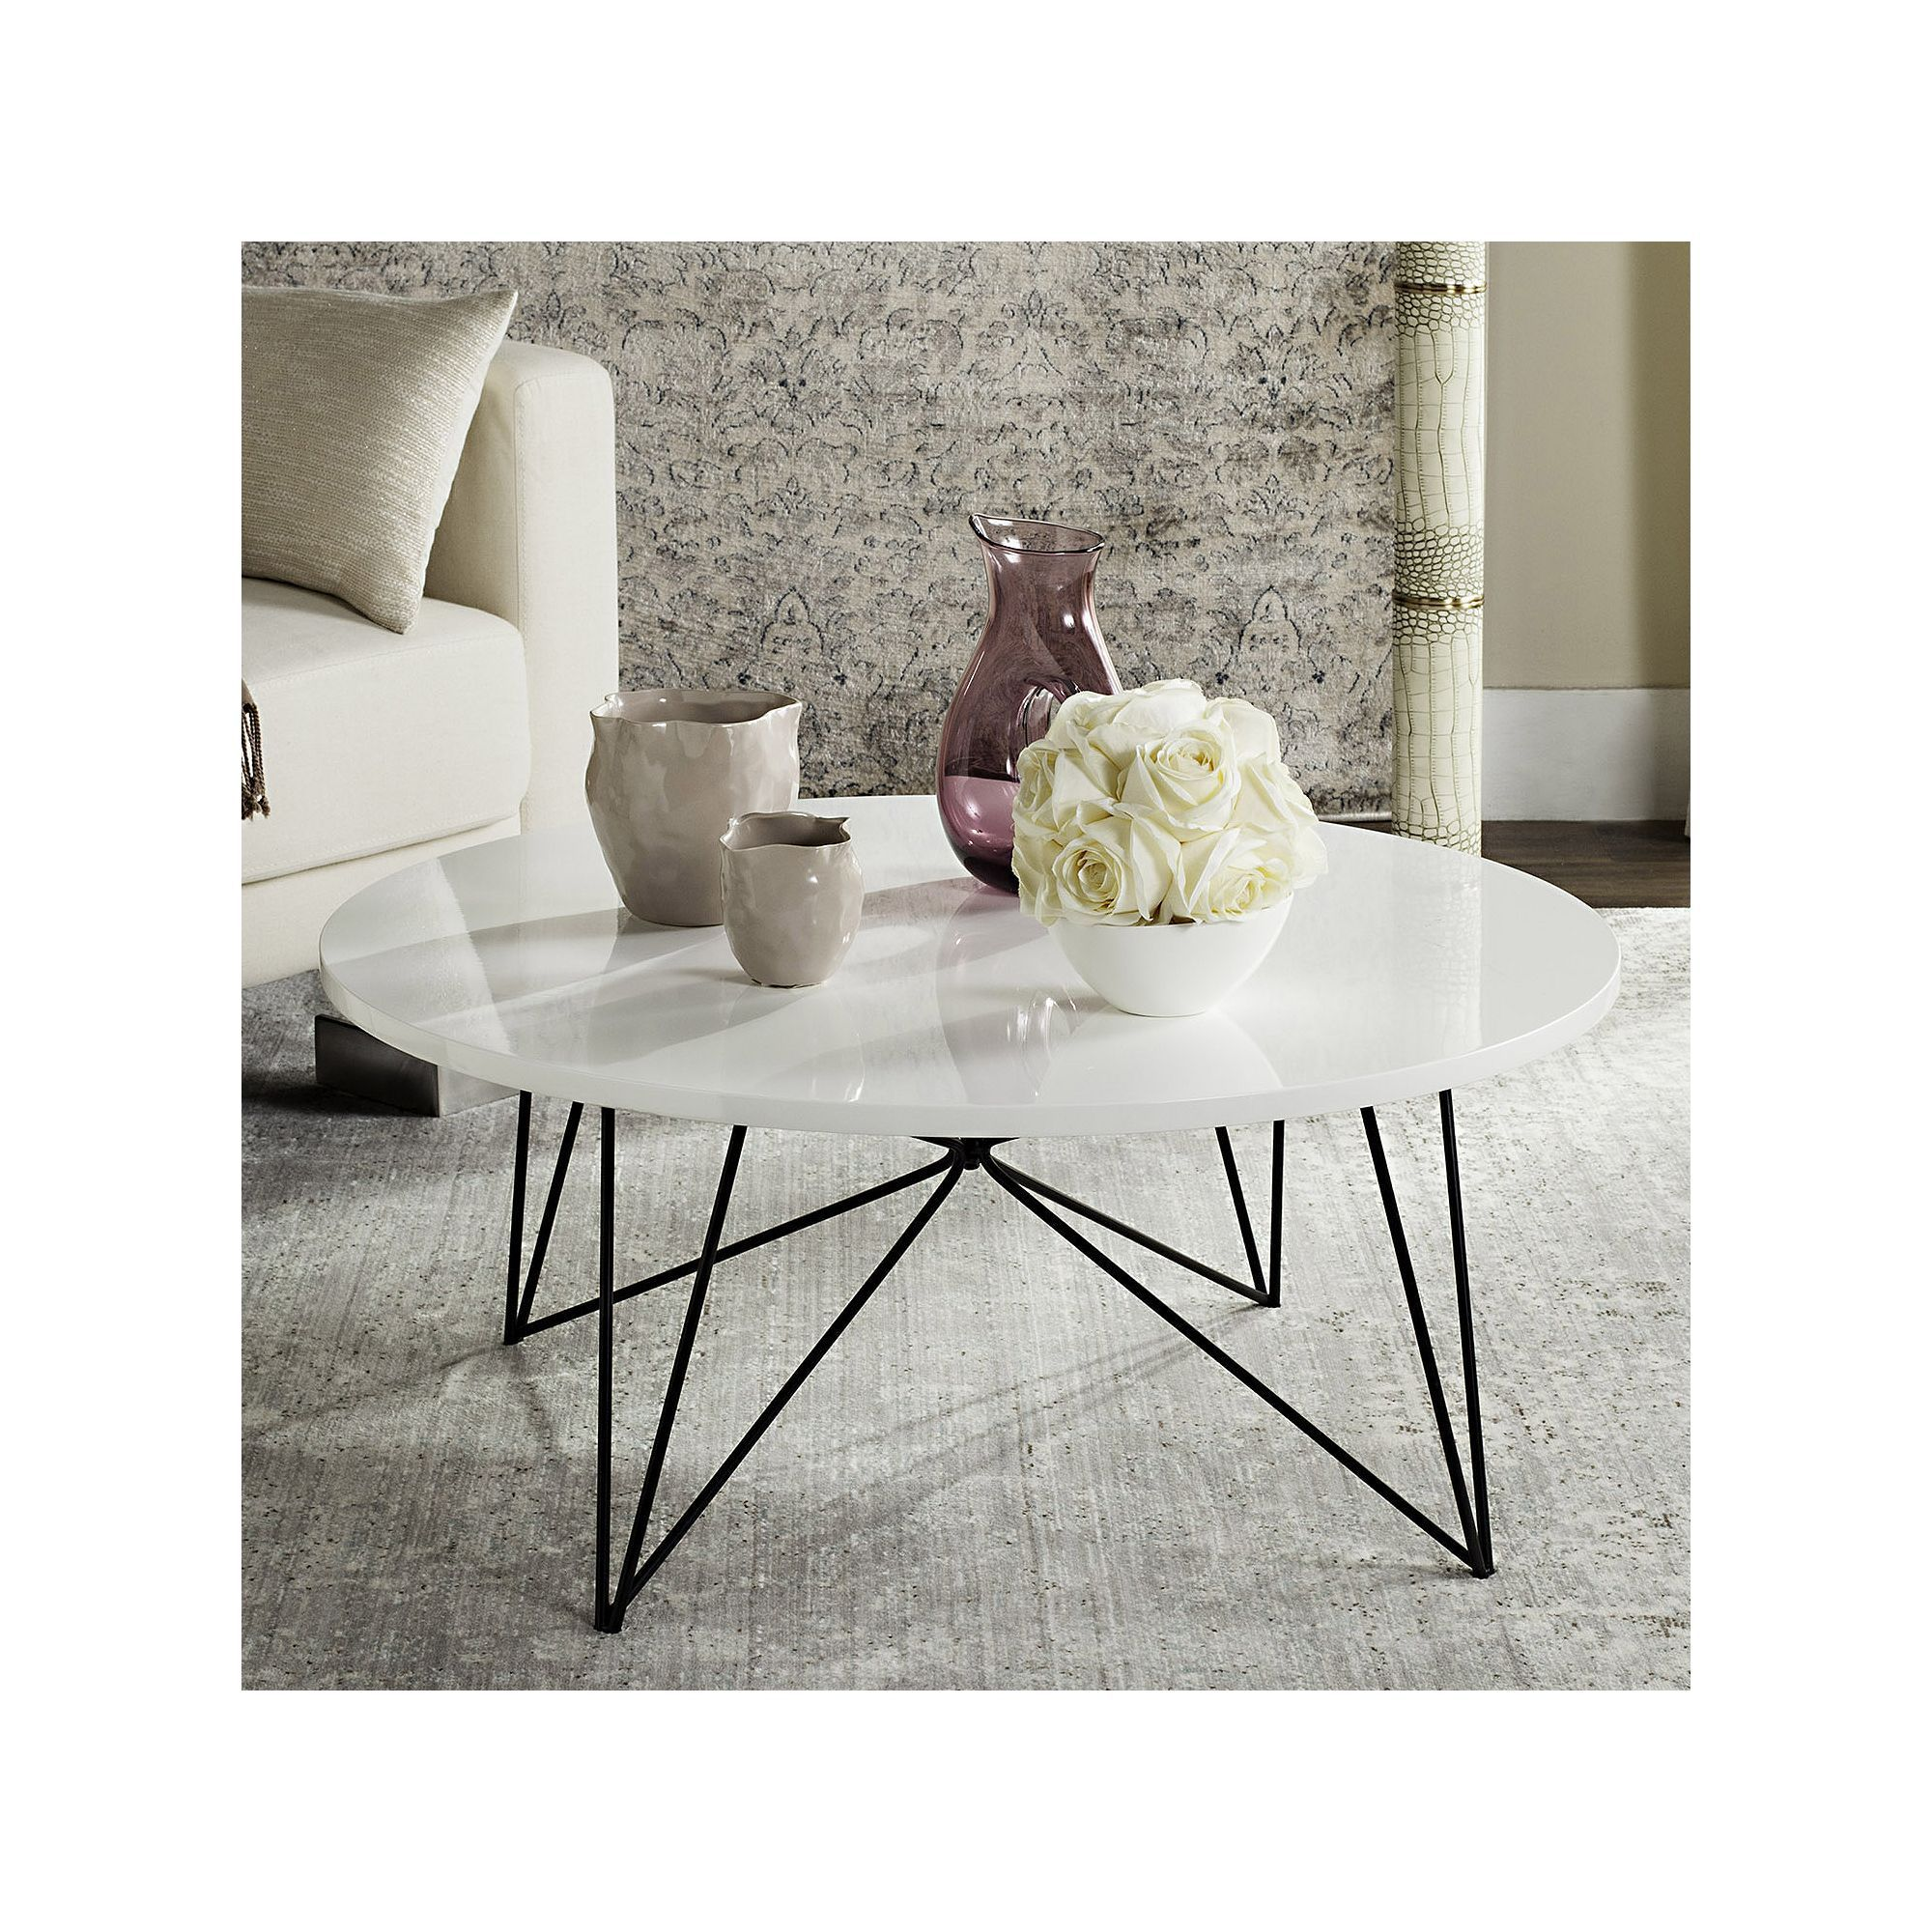 Safavieh Mid Century Modern Coffee Table In 2021 Mid Century Modern Coffee Table Coffee Table Mid Century Coffee Table [ 2000 x 2000 Pixel ]